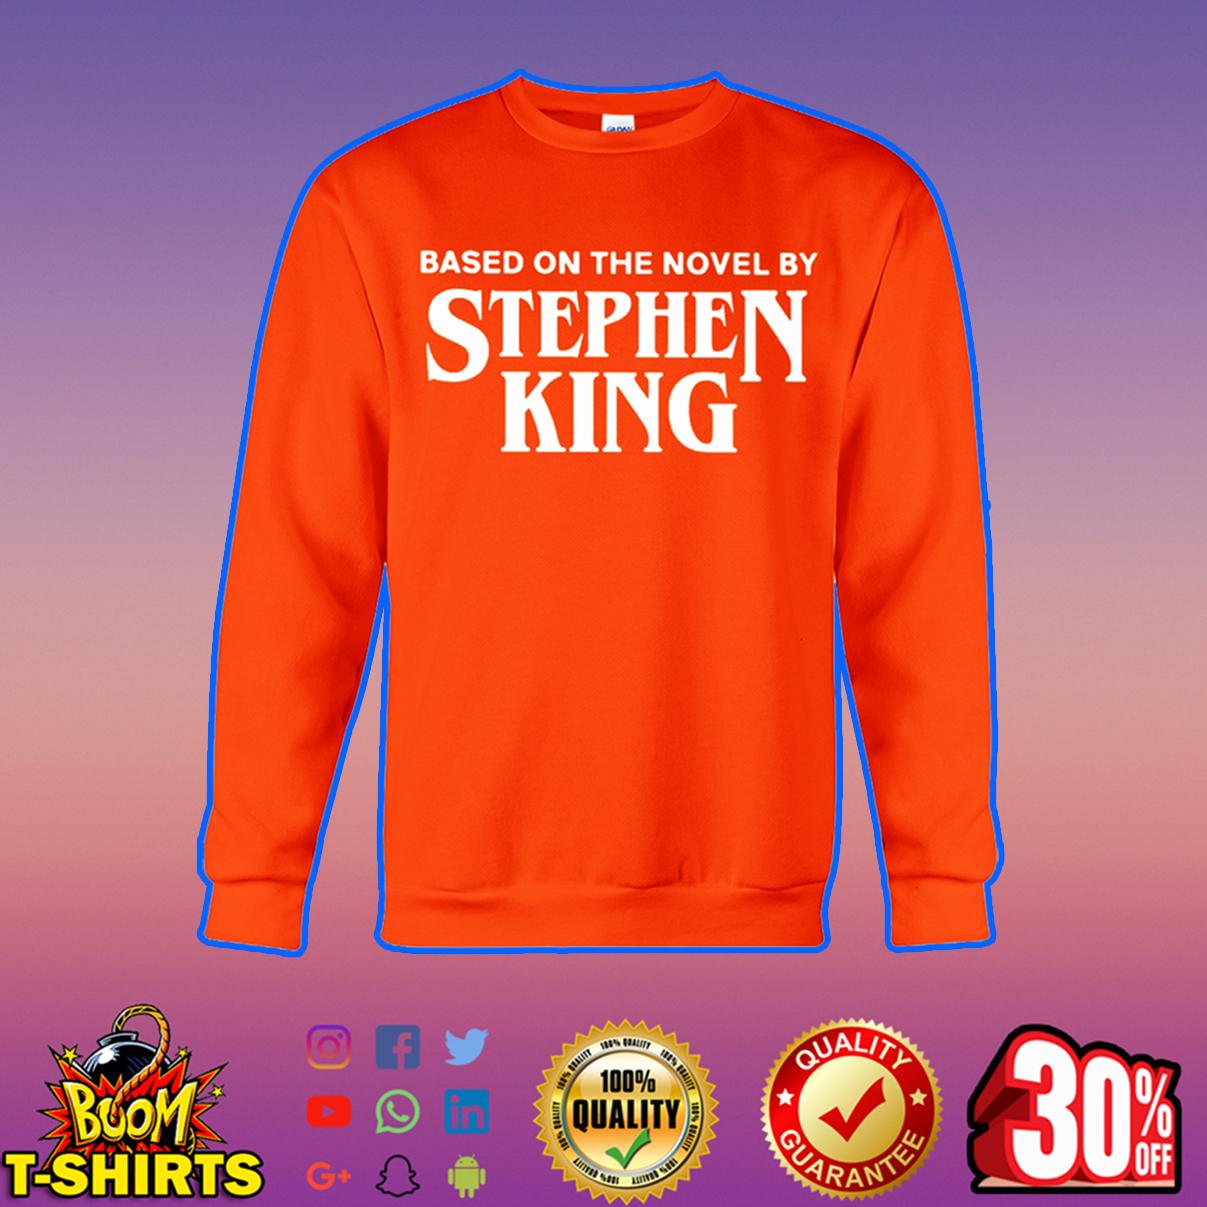 Based on the novel by Stephen King sweatshirt